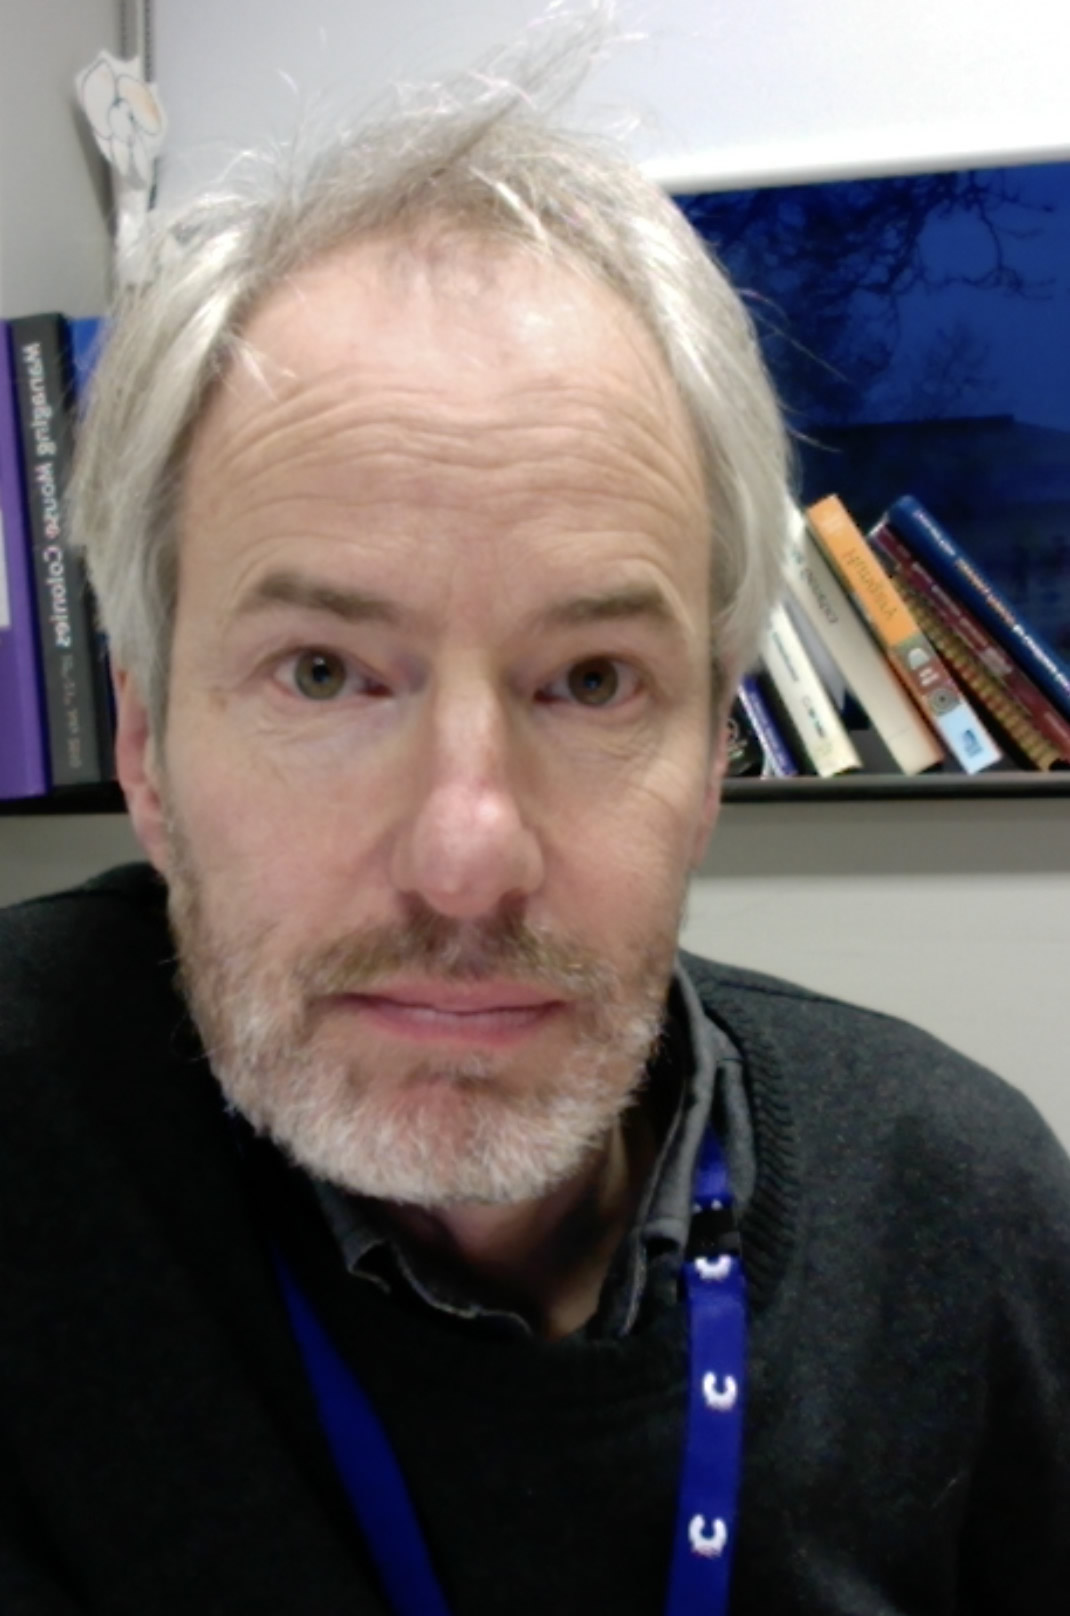 Ian Rosewell